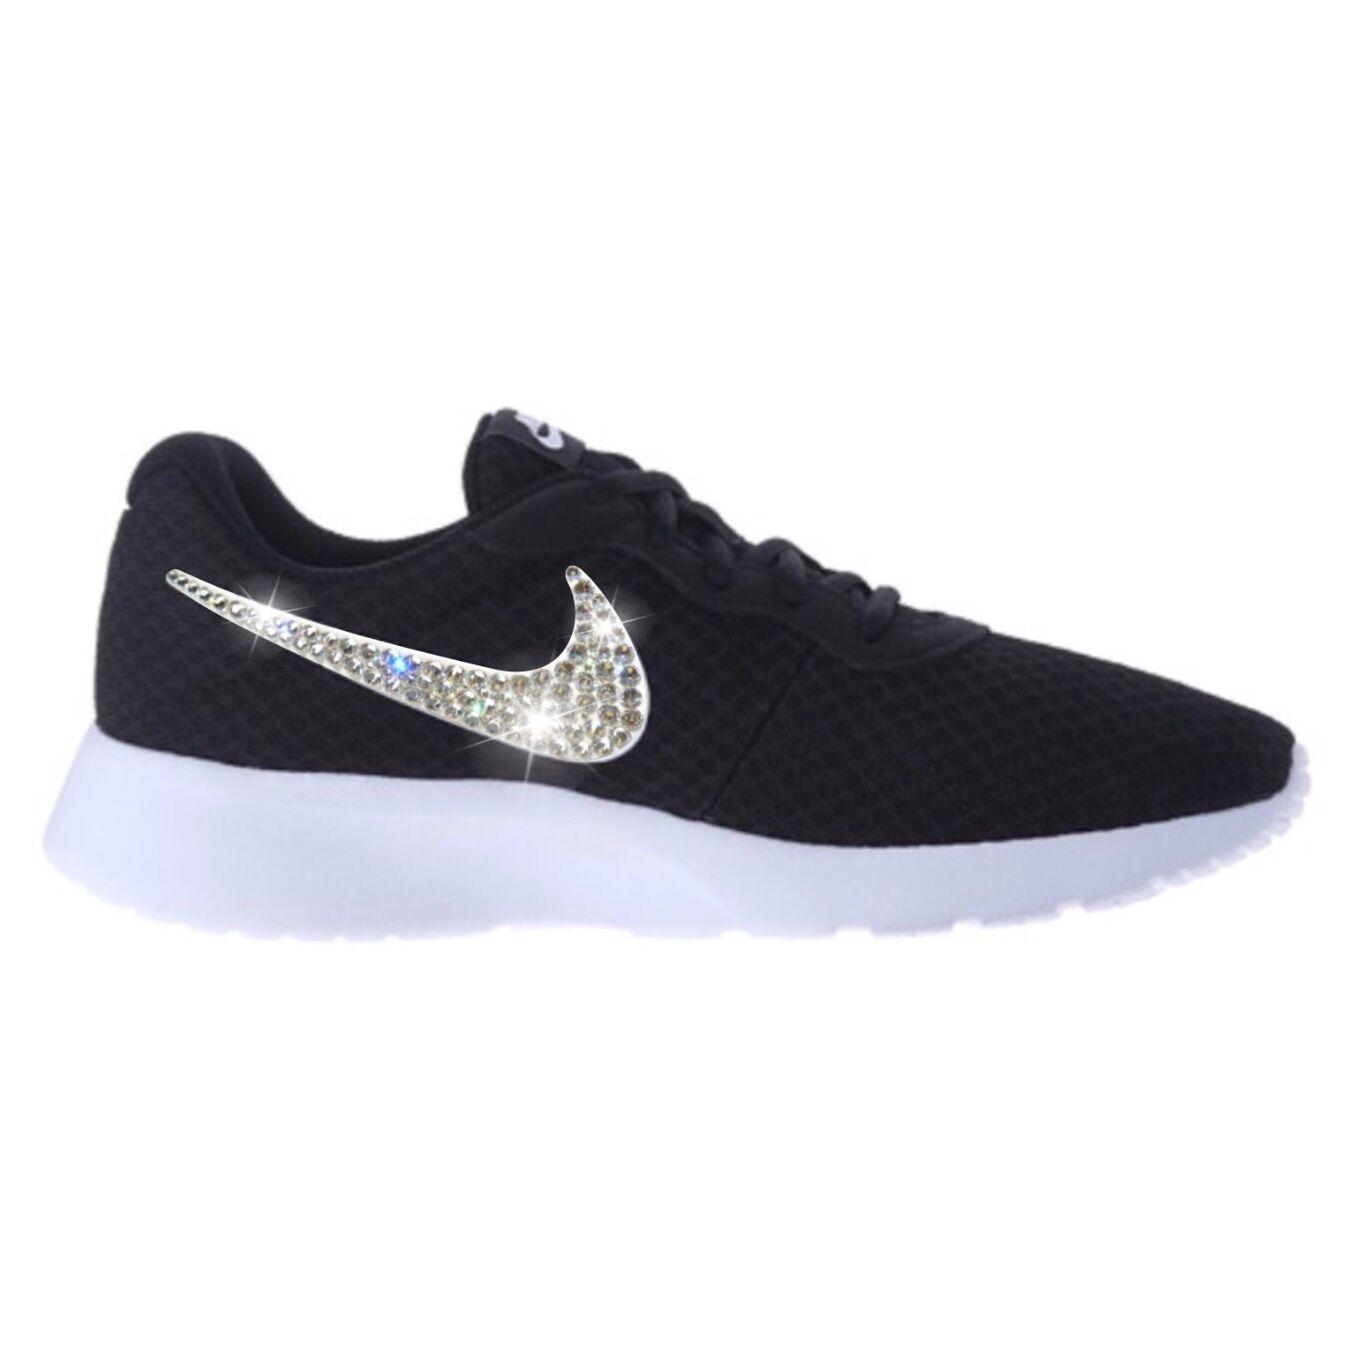 Bling Nike Tanjun Shoes with Swarovski Crystal Diamond Rhinestone - Black White